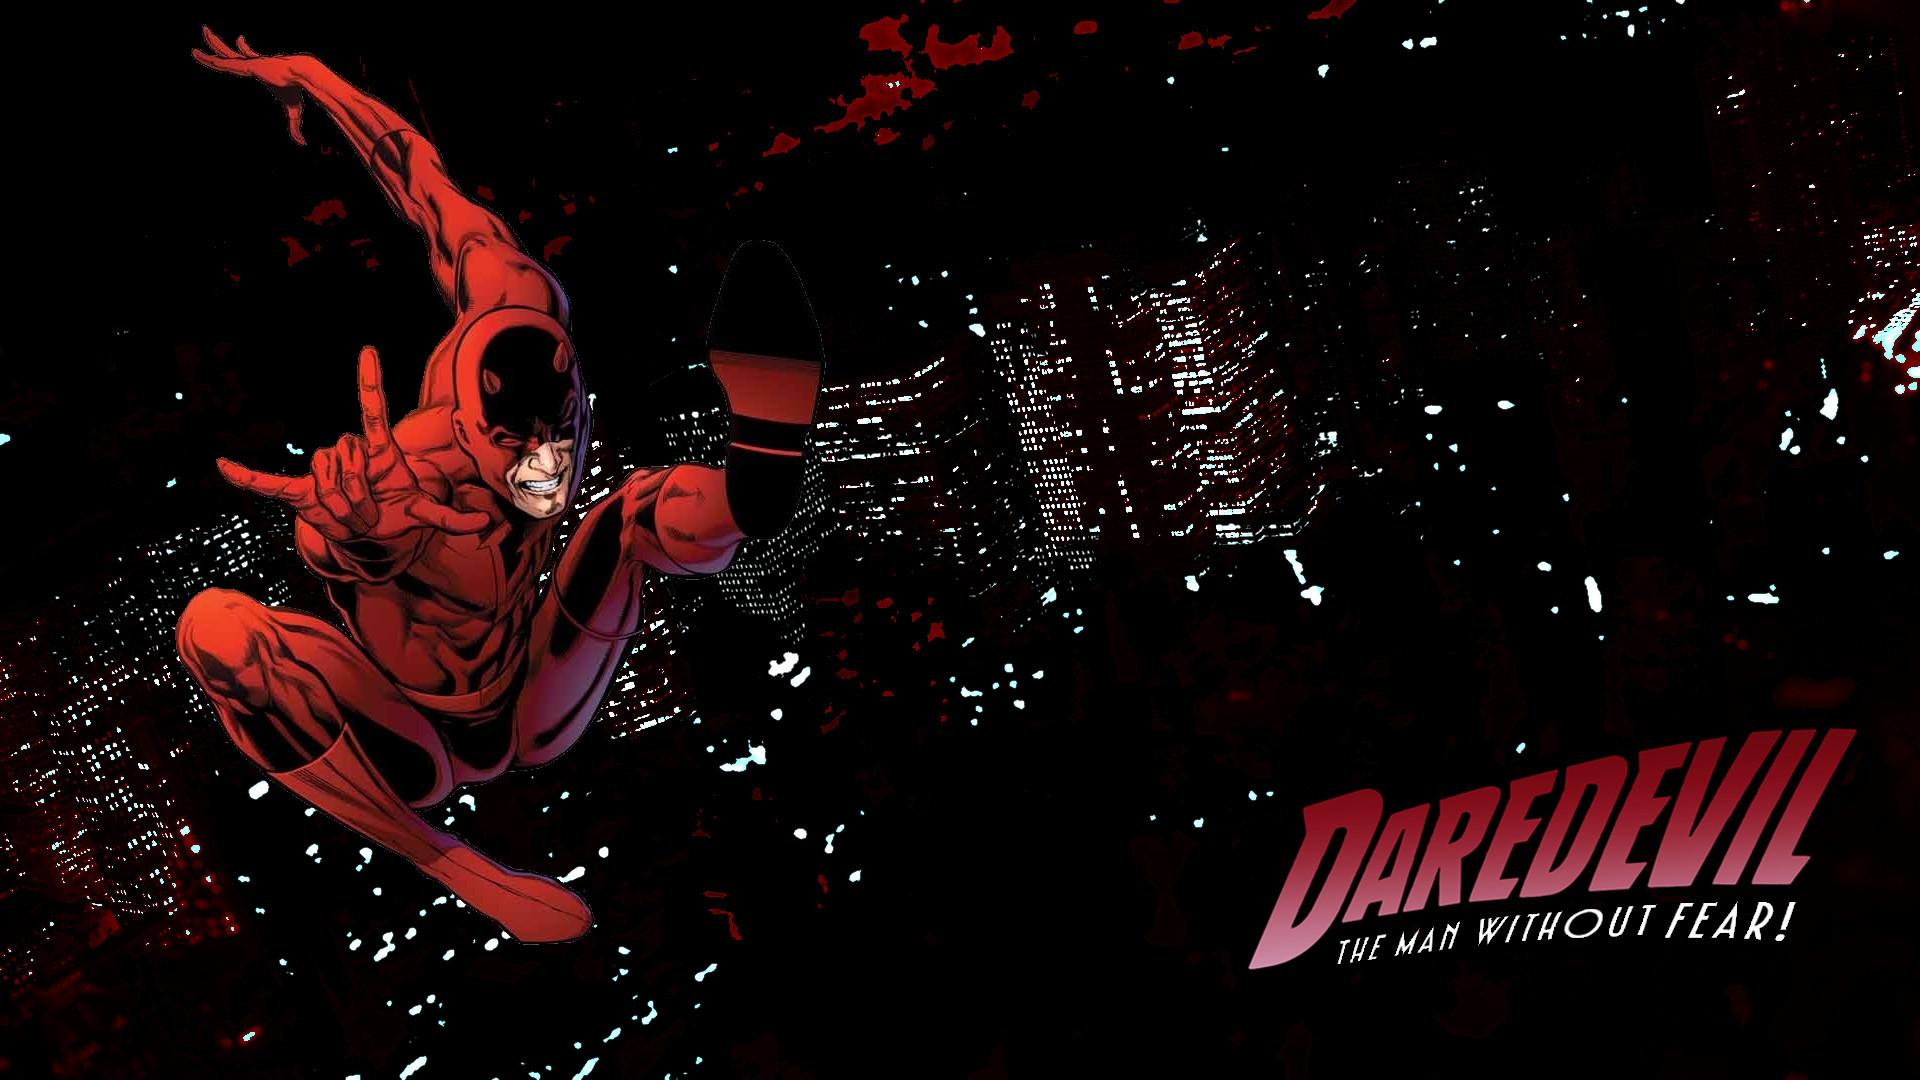 Daredevil wallpaper I made in celebration of season 2 (1920×1080) Need # iPhone #